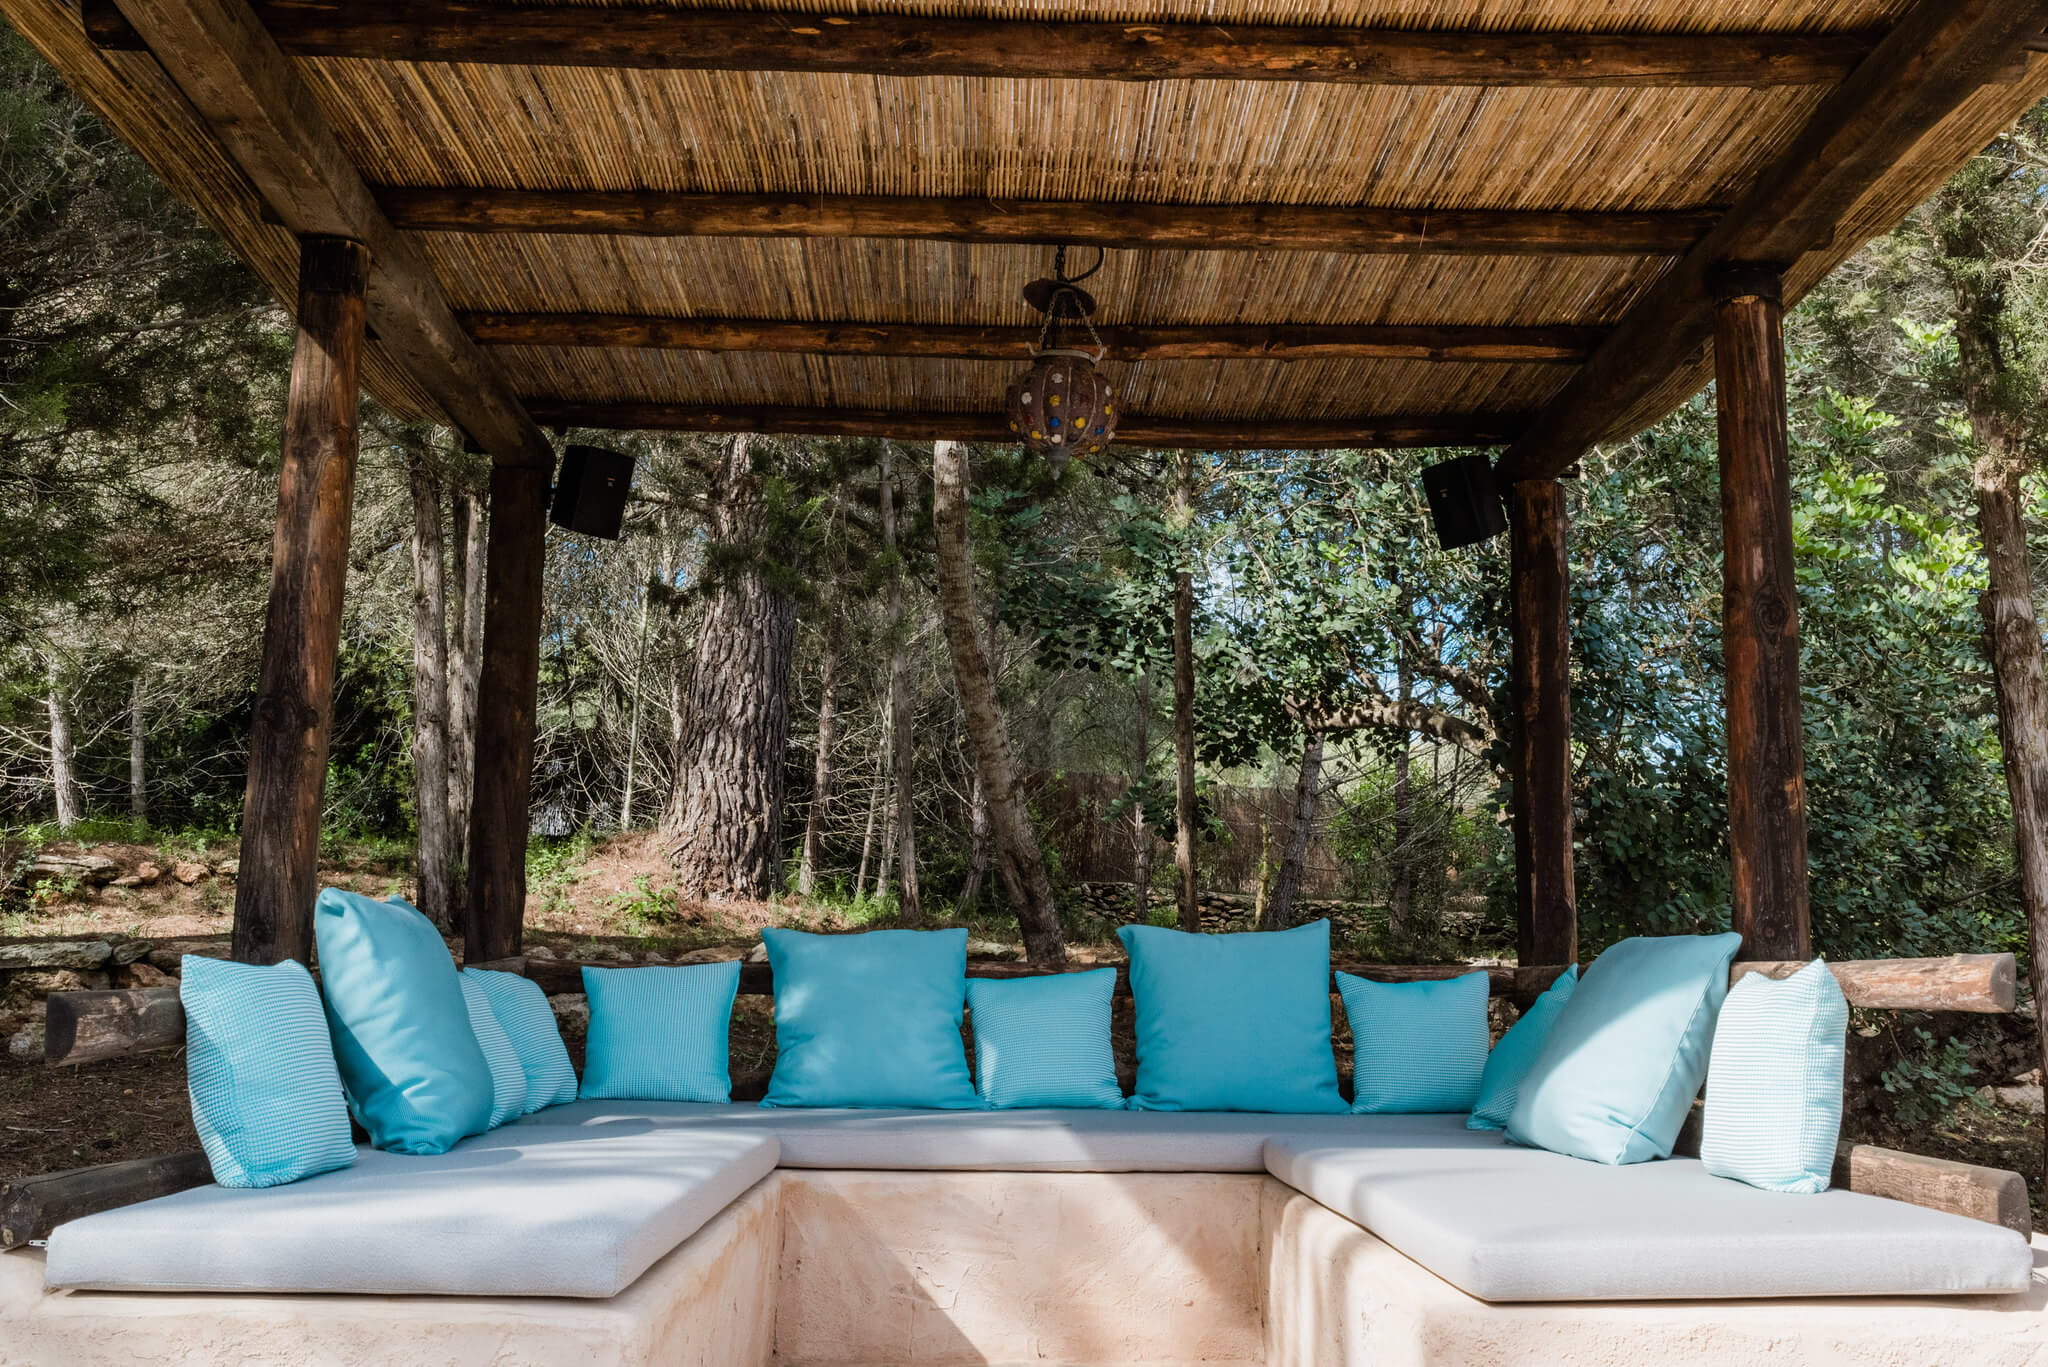 https://www.white-ibiza.com/wp-content/uploads/2020/05/white-ibiza-villas-can-sabina-exterior-seating.jpg